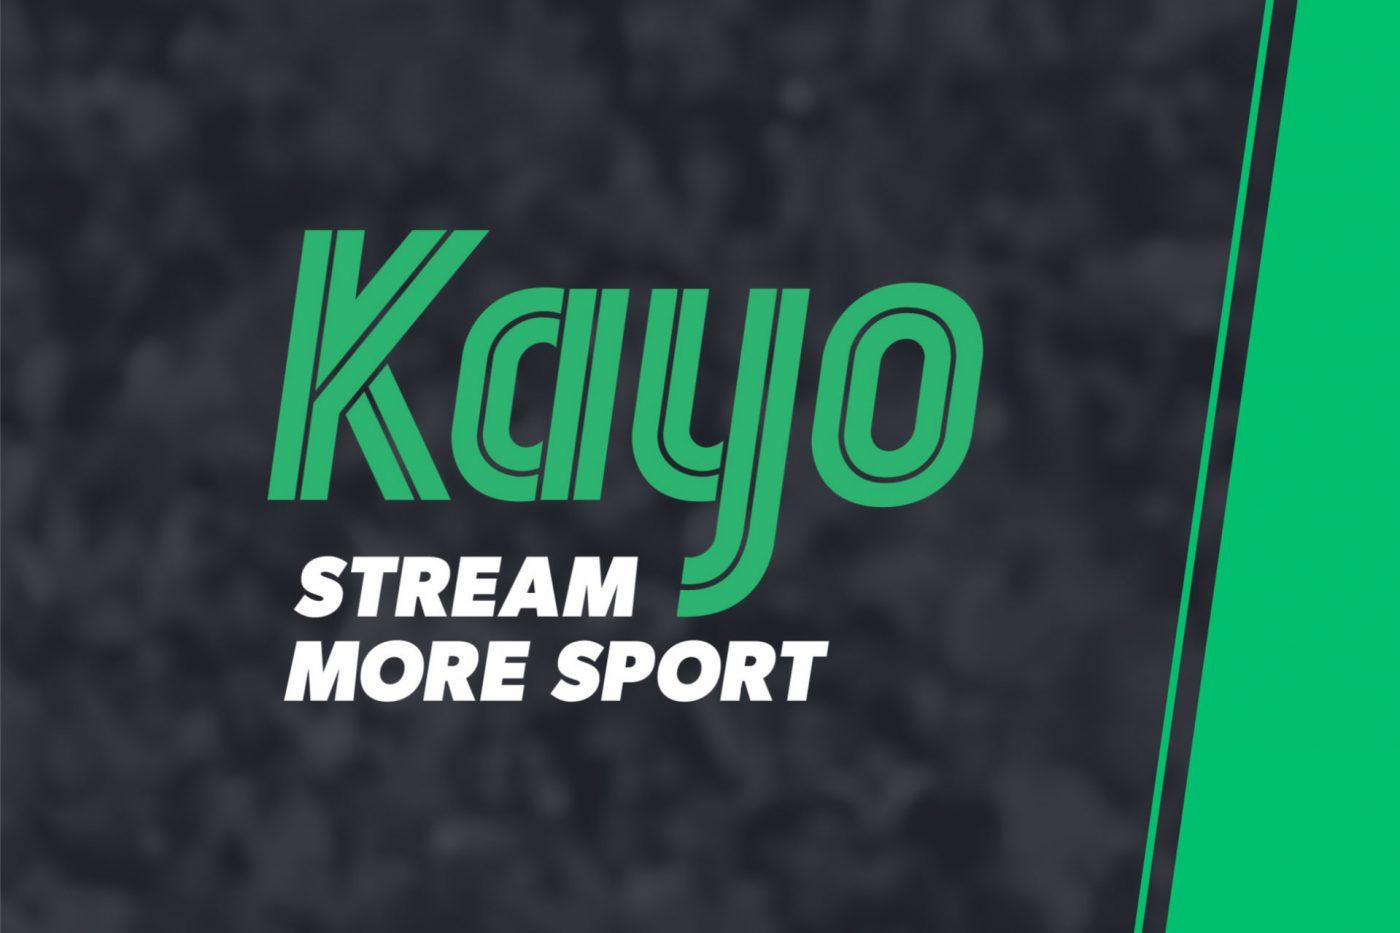 Kayo-Sports-Streaming-Service-Australia